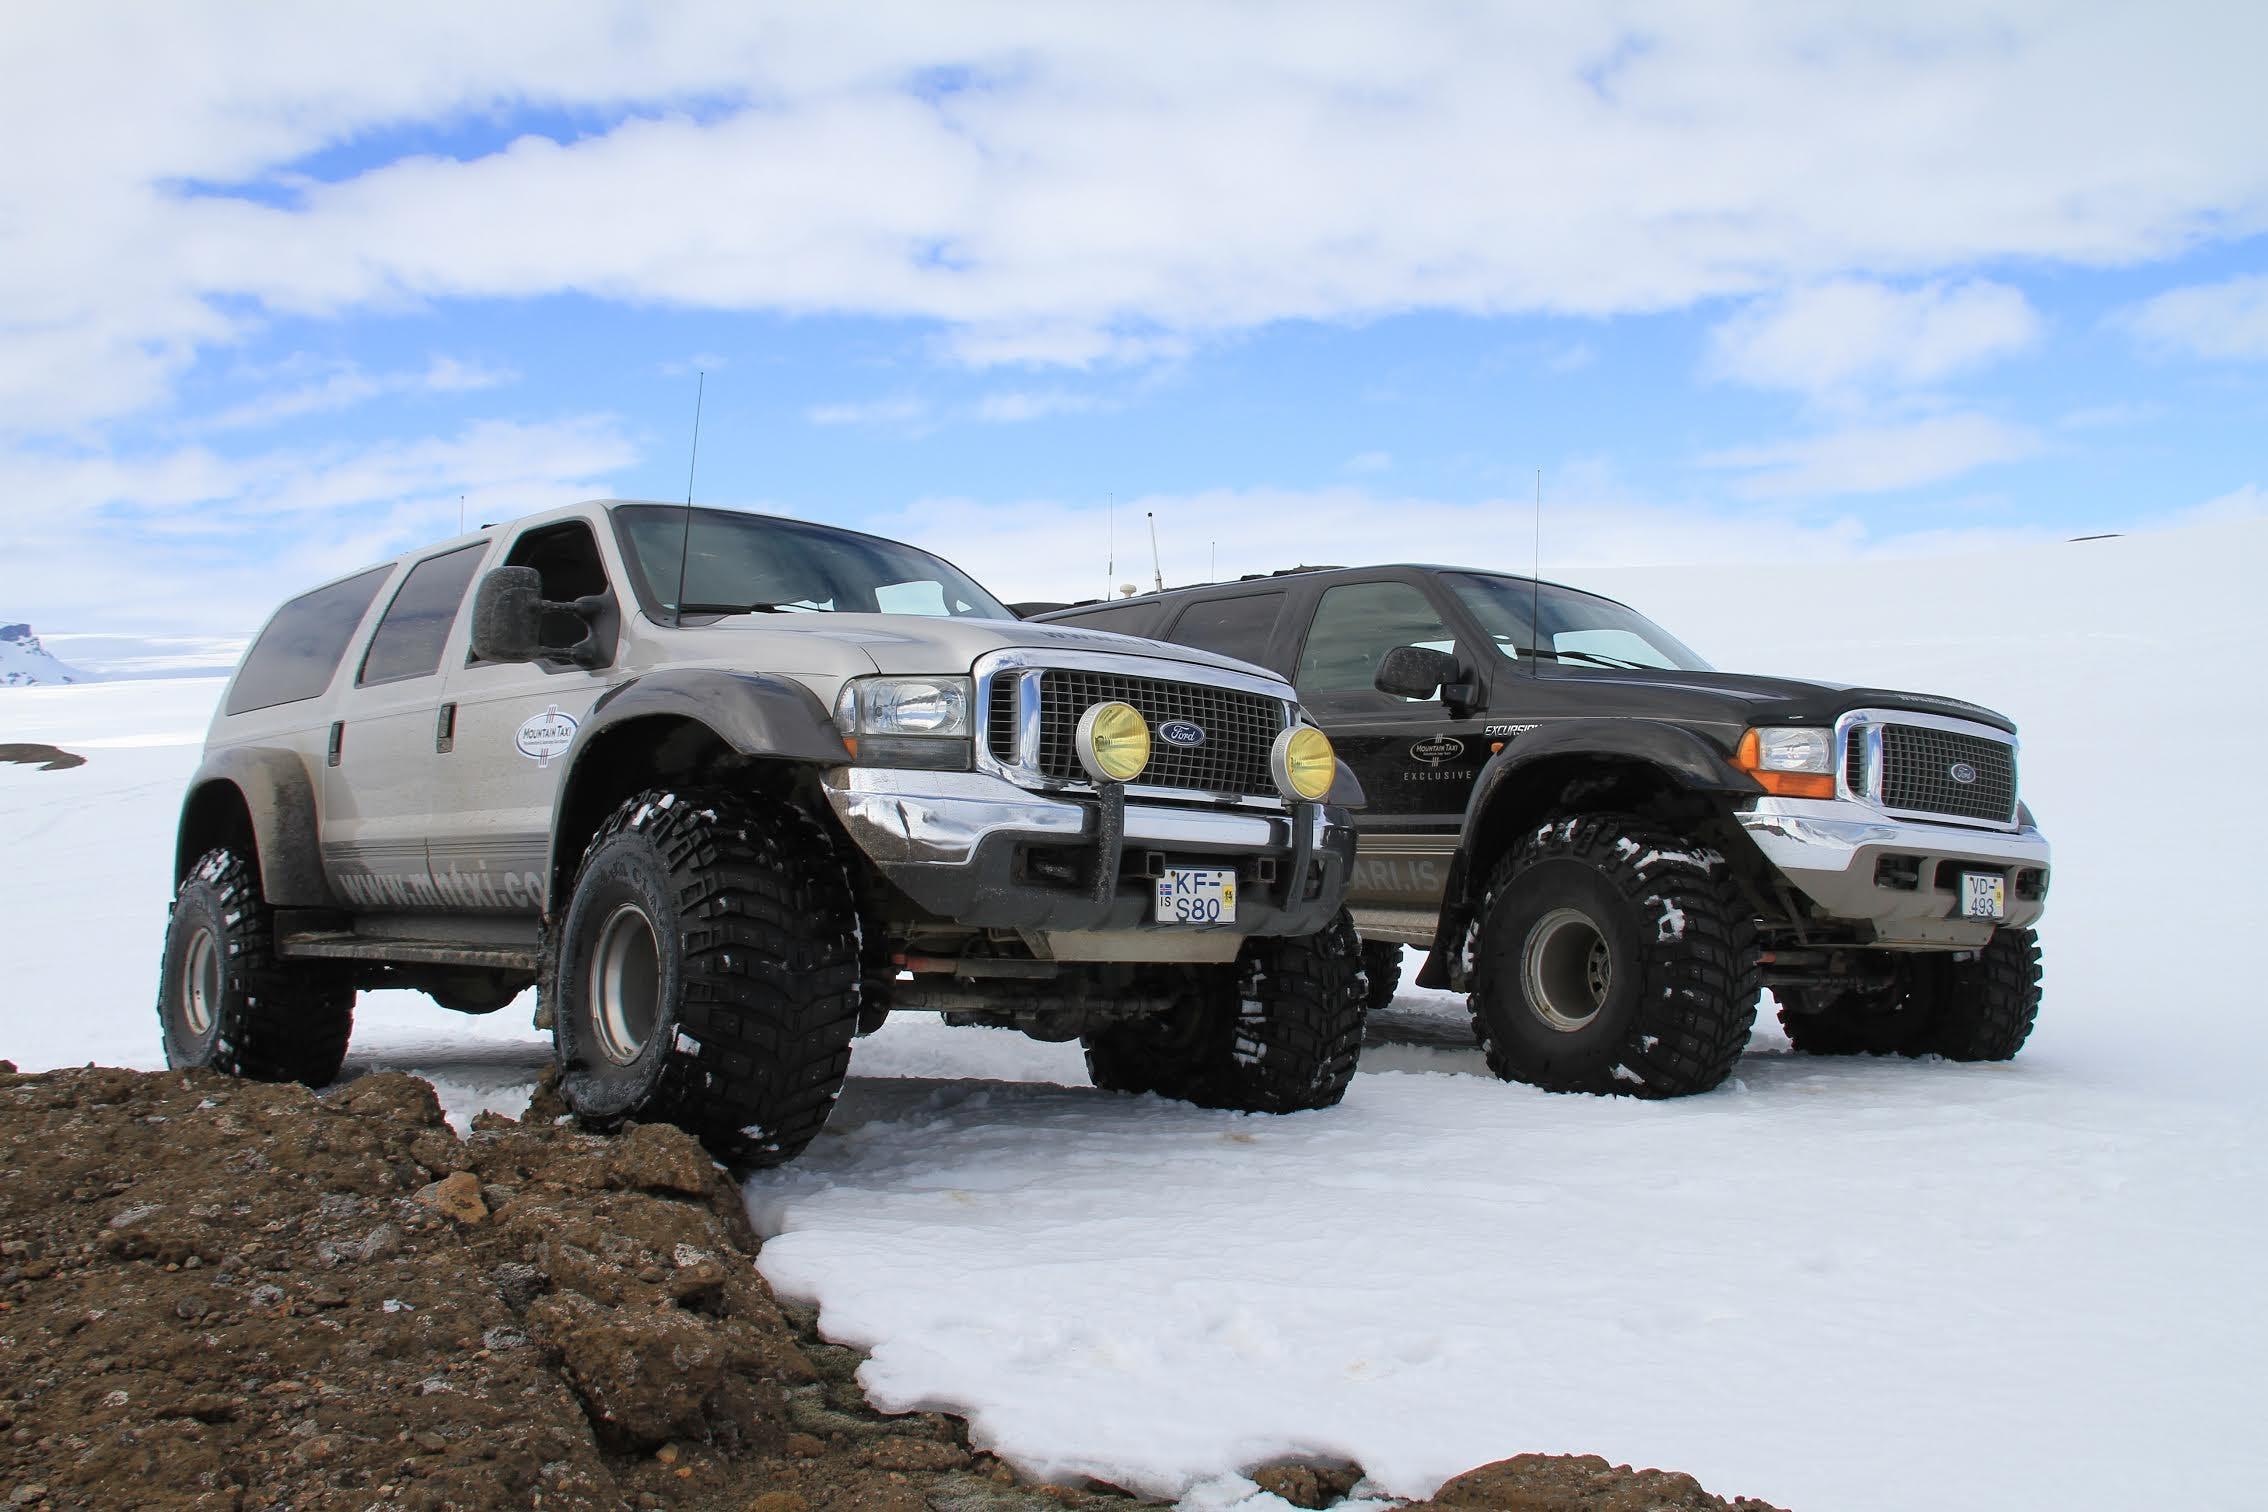 Thorsmork Valley and Volcano Eyjafjallajökull   Super Jeep Tour